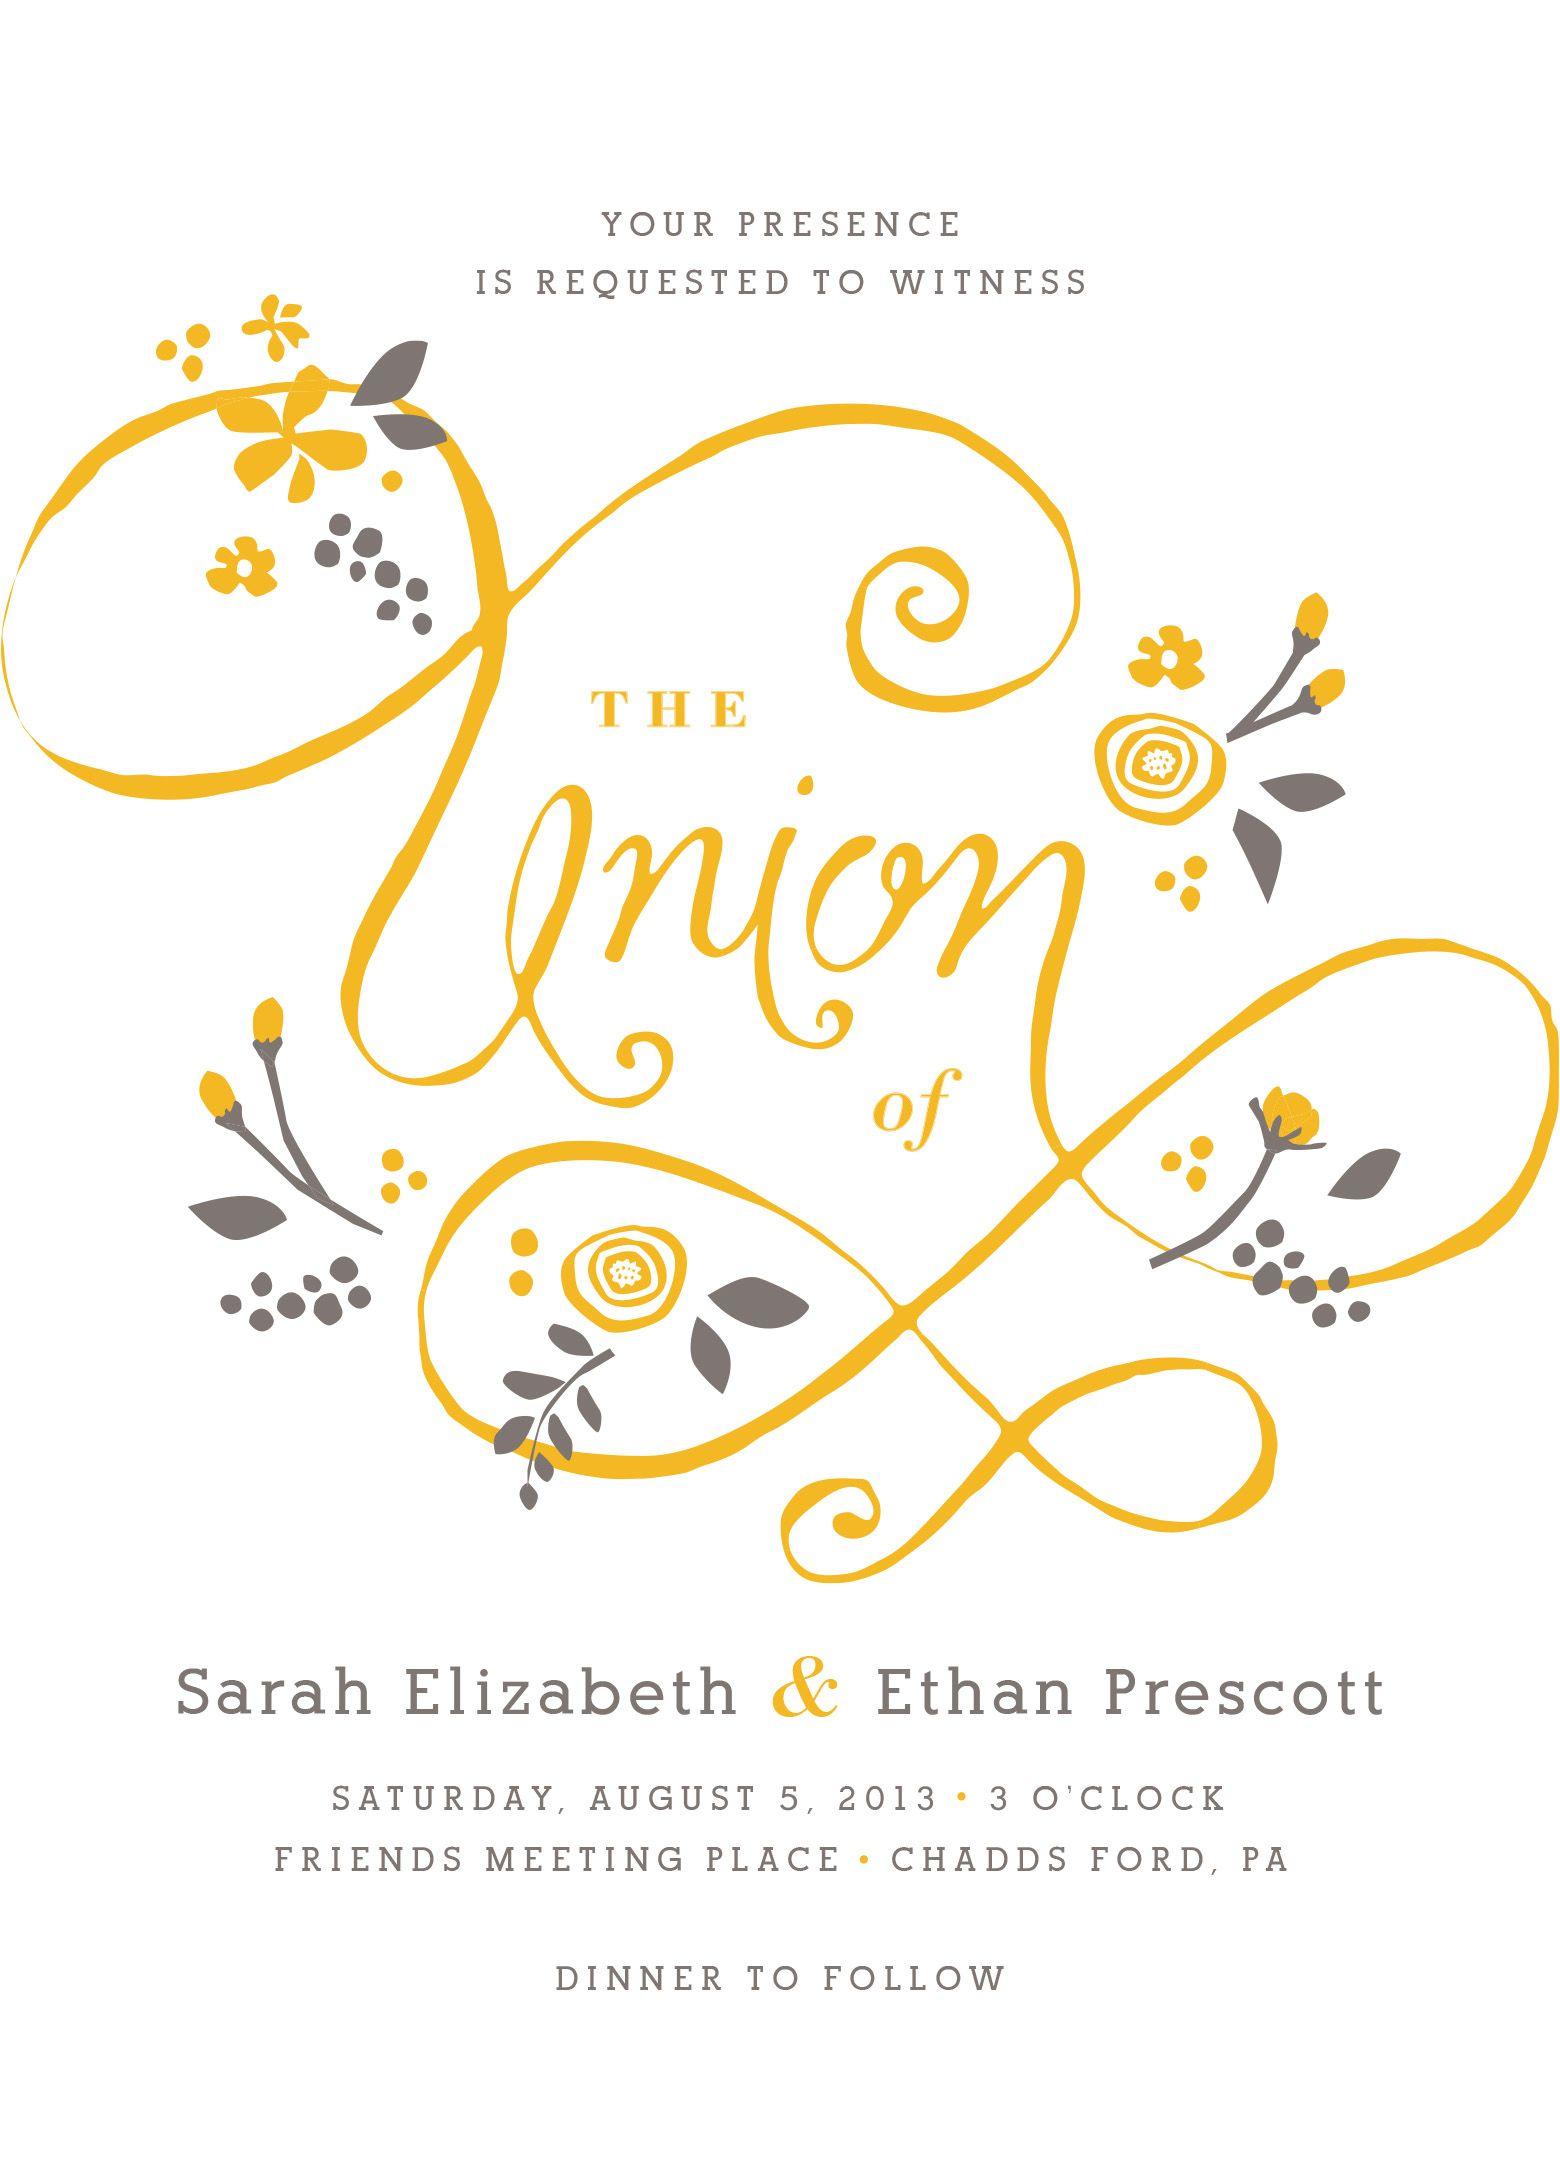 A More Perfect Union Letterpress Wedding Invitation By